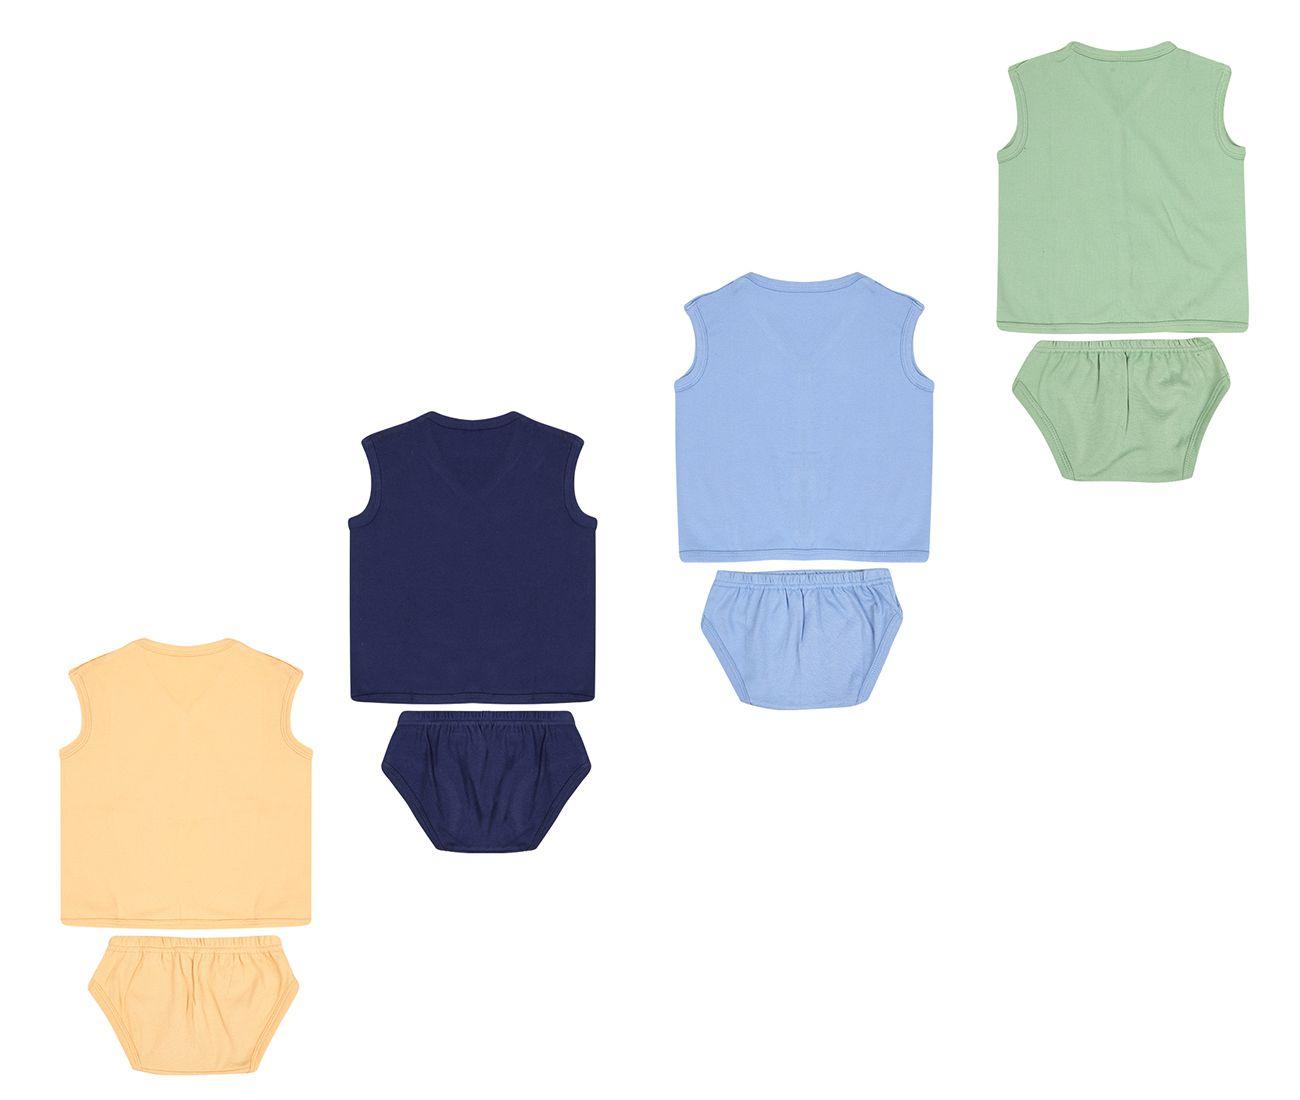 Dongli Unisex Soft Cotton Baby Set Dress (Pack of 4)